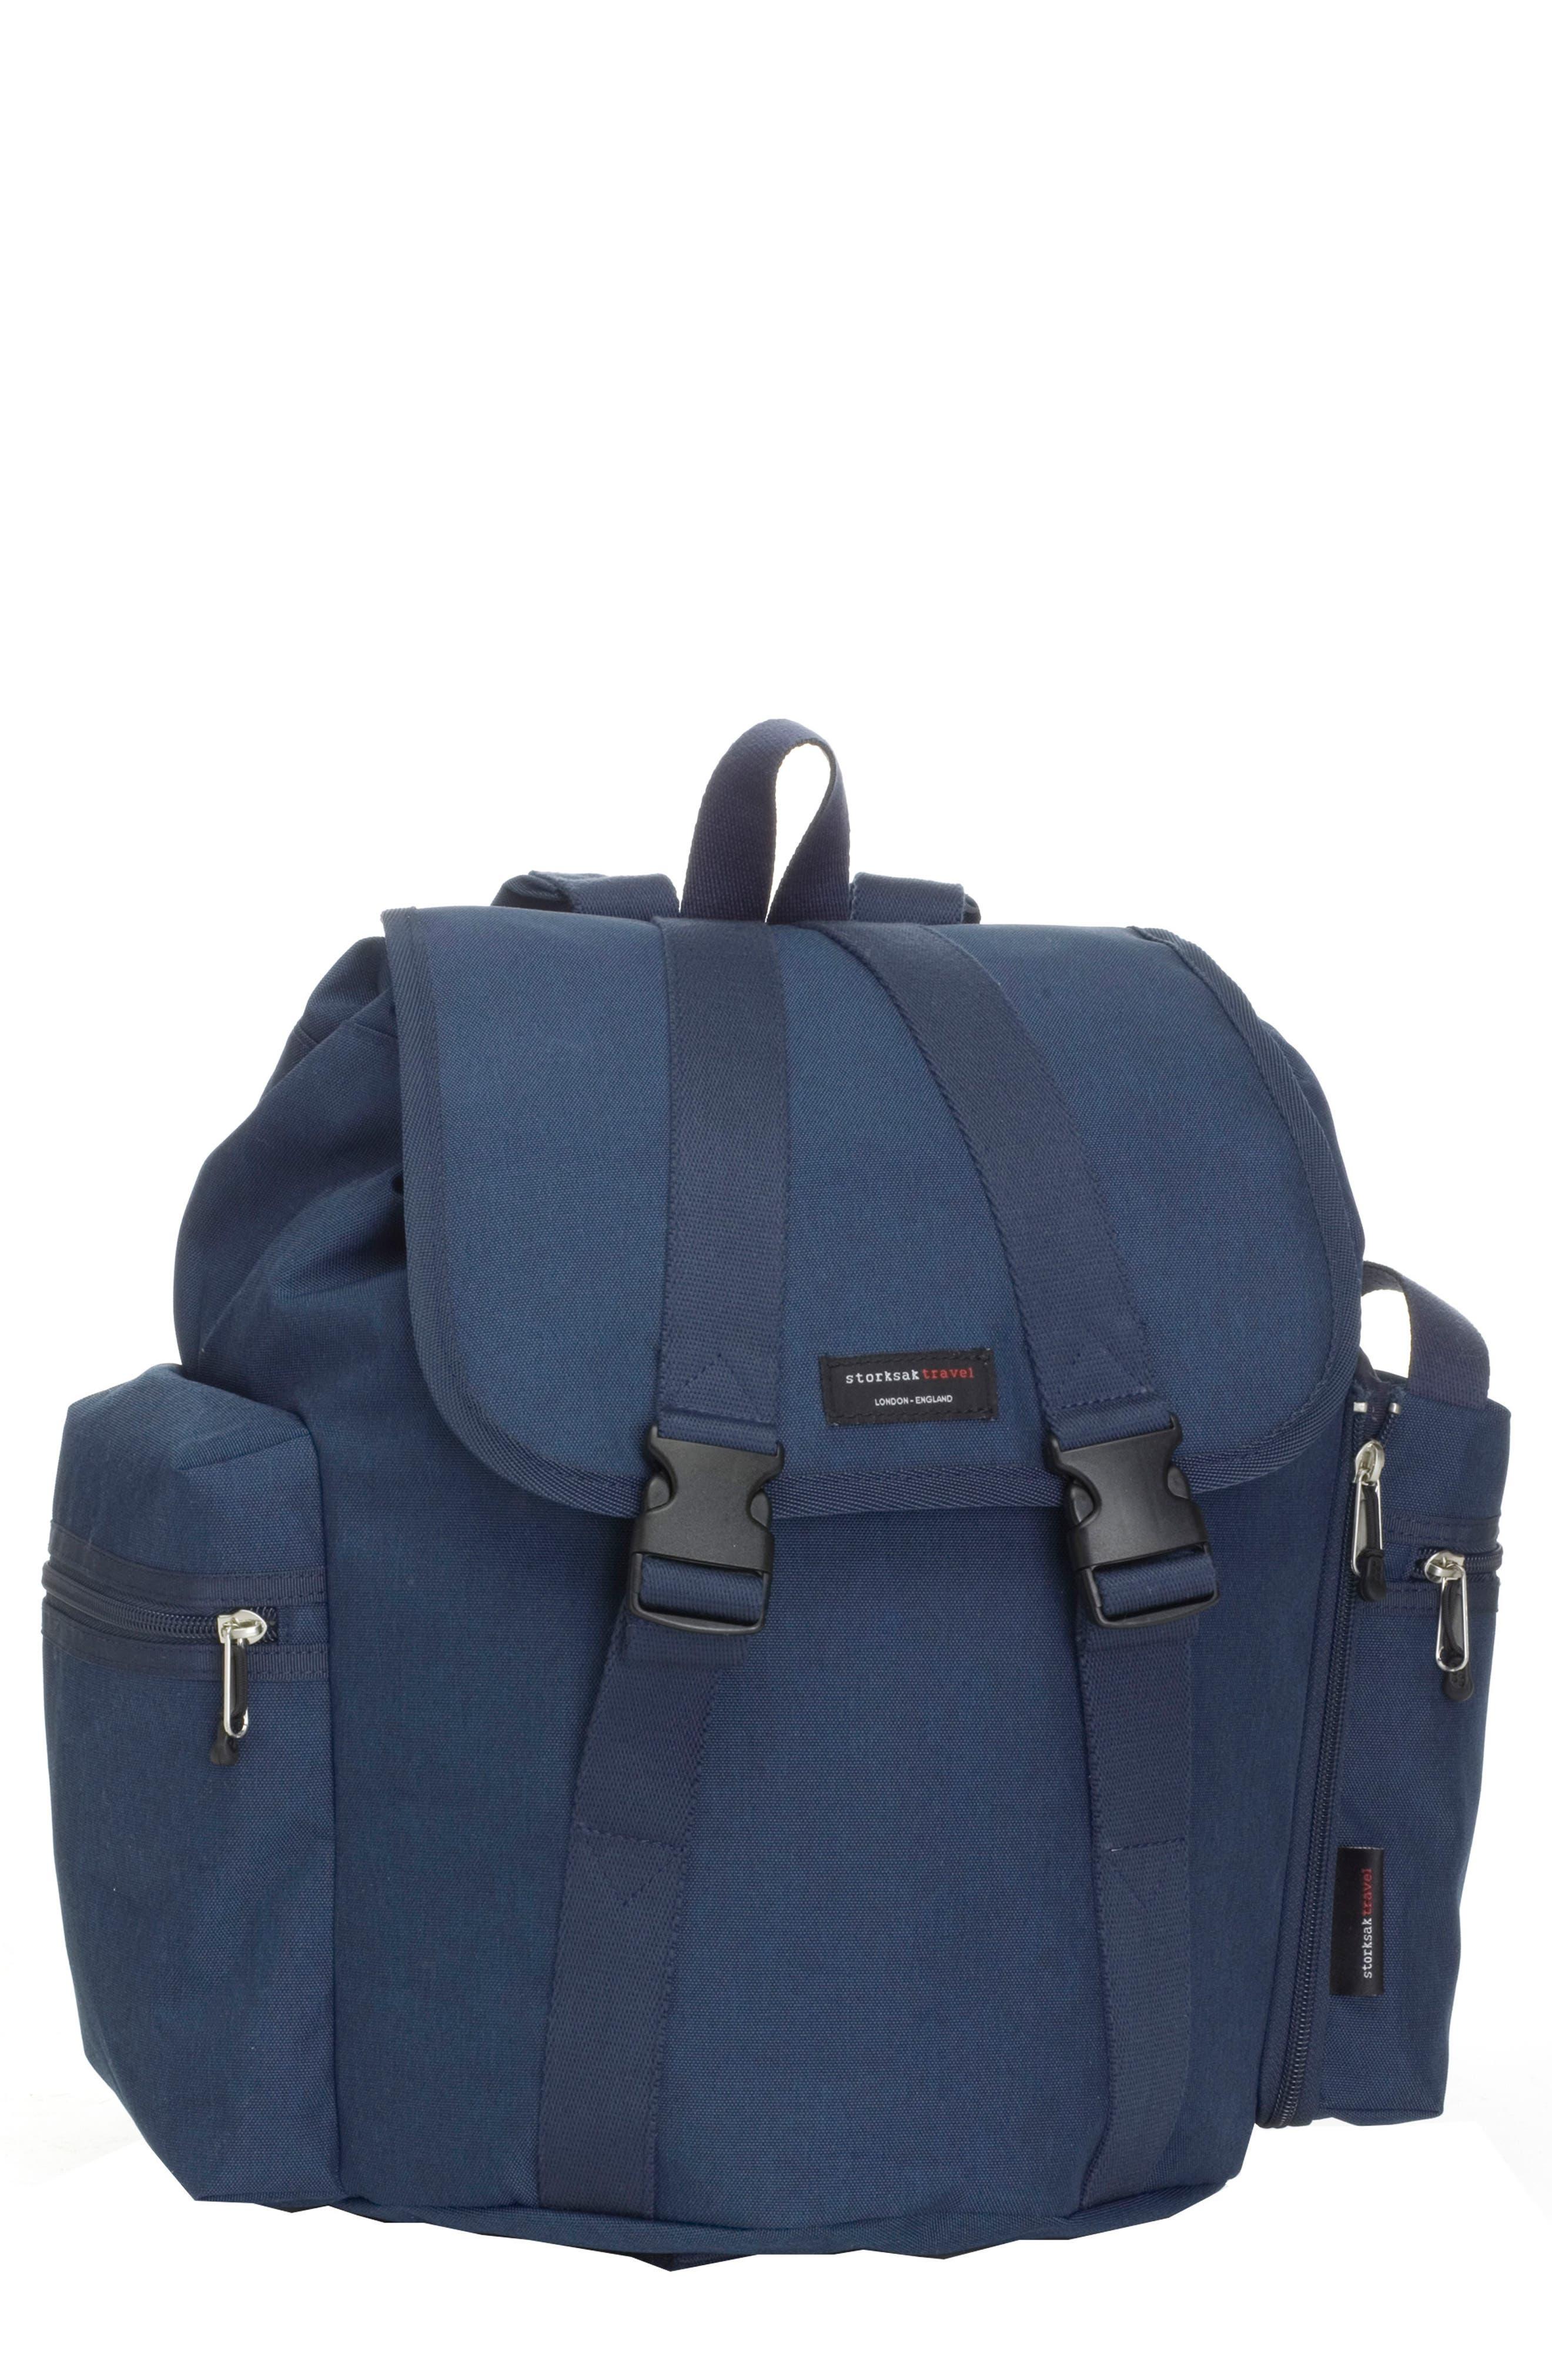 Travel Backpack Diaper Bag,                         Main,                         color, Navy